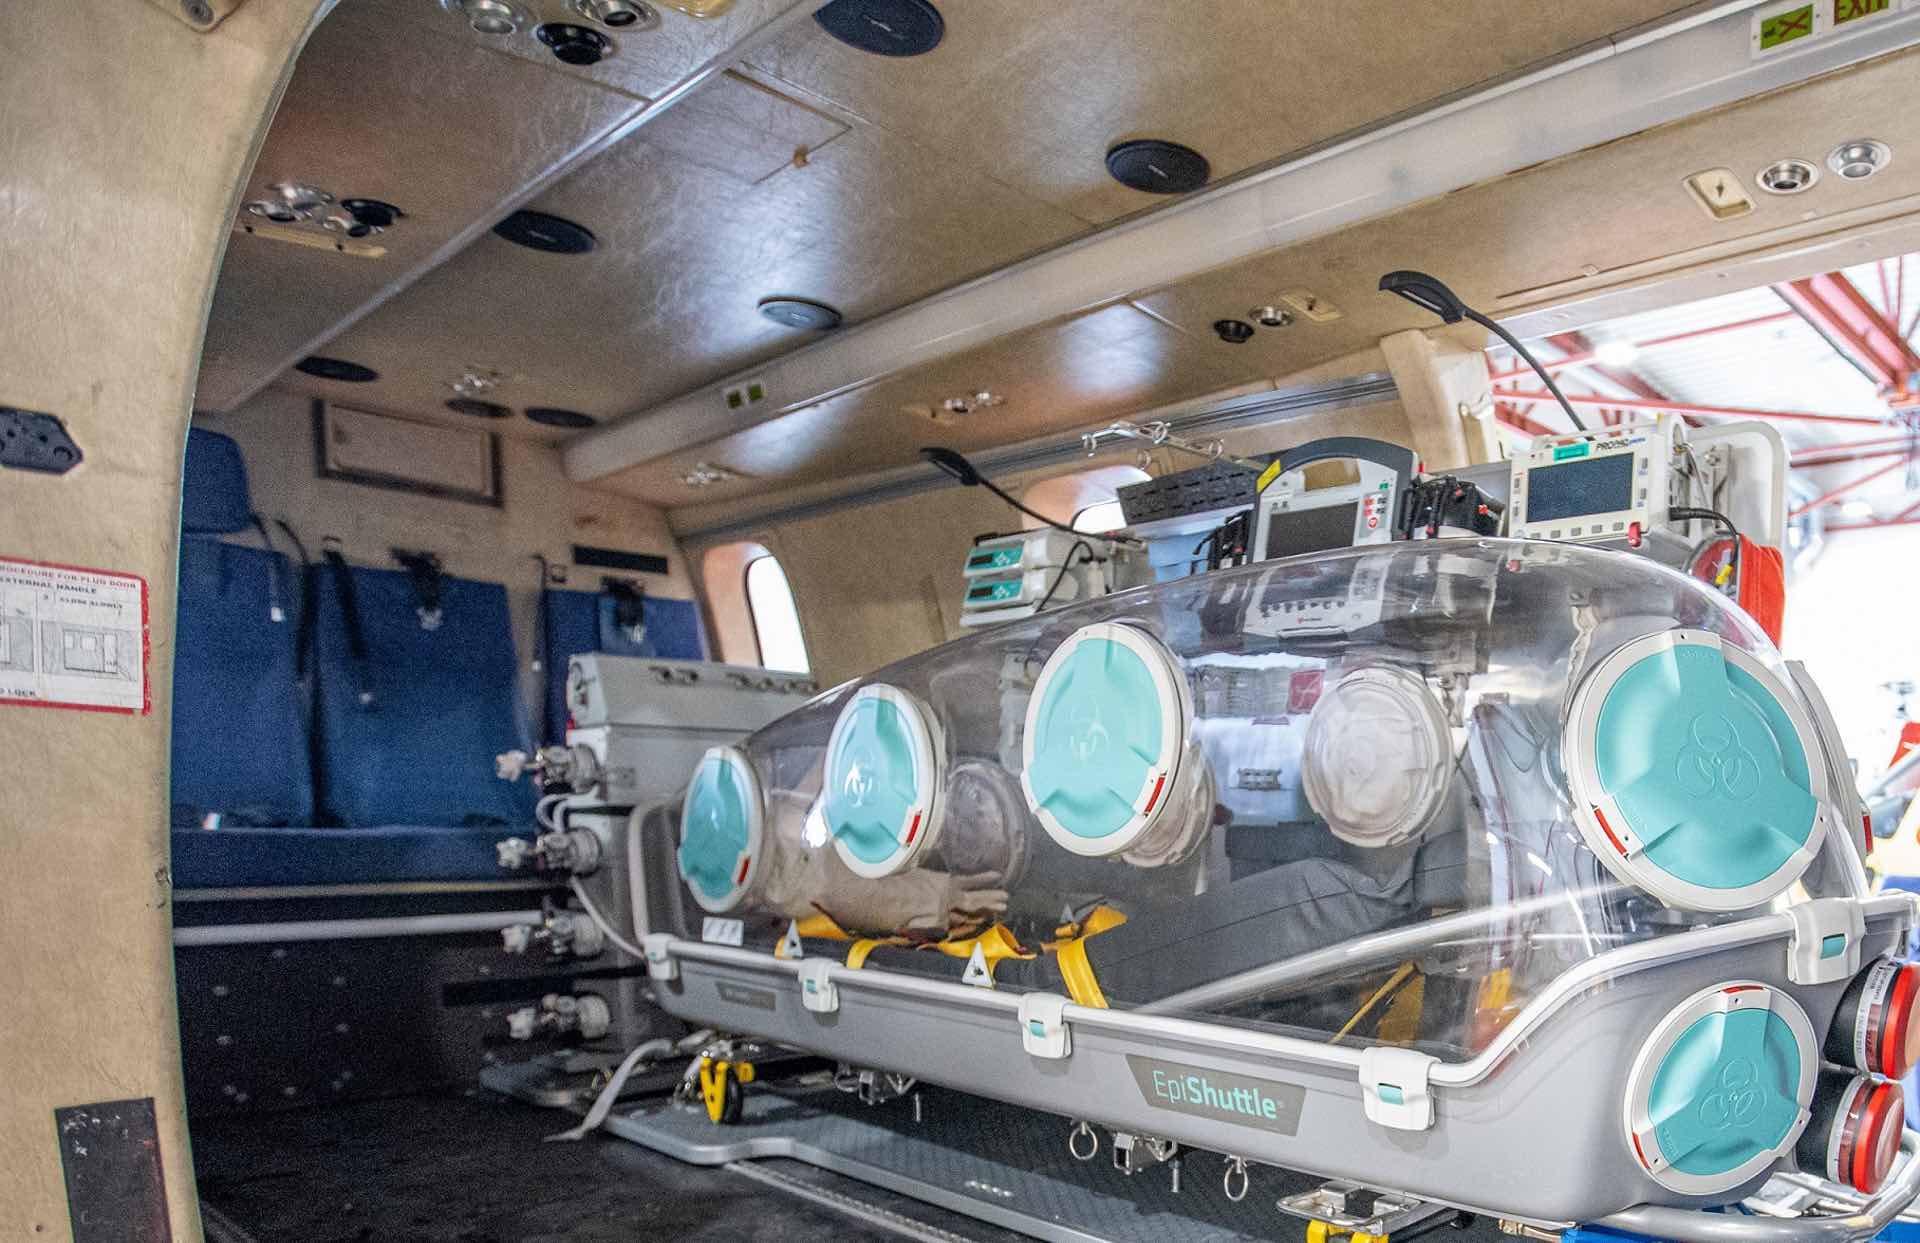 Air ambulance covid 19